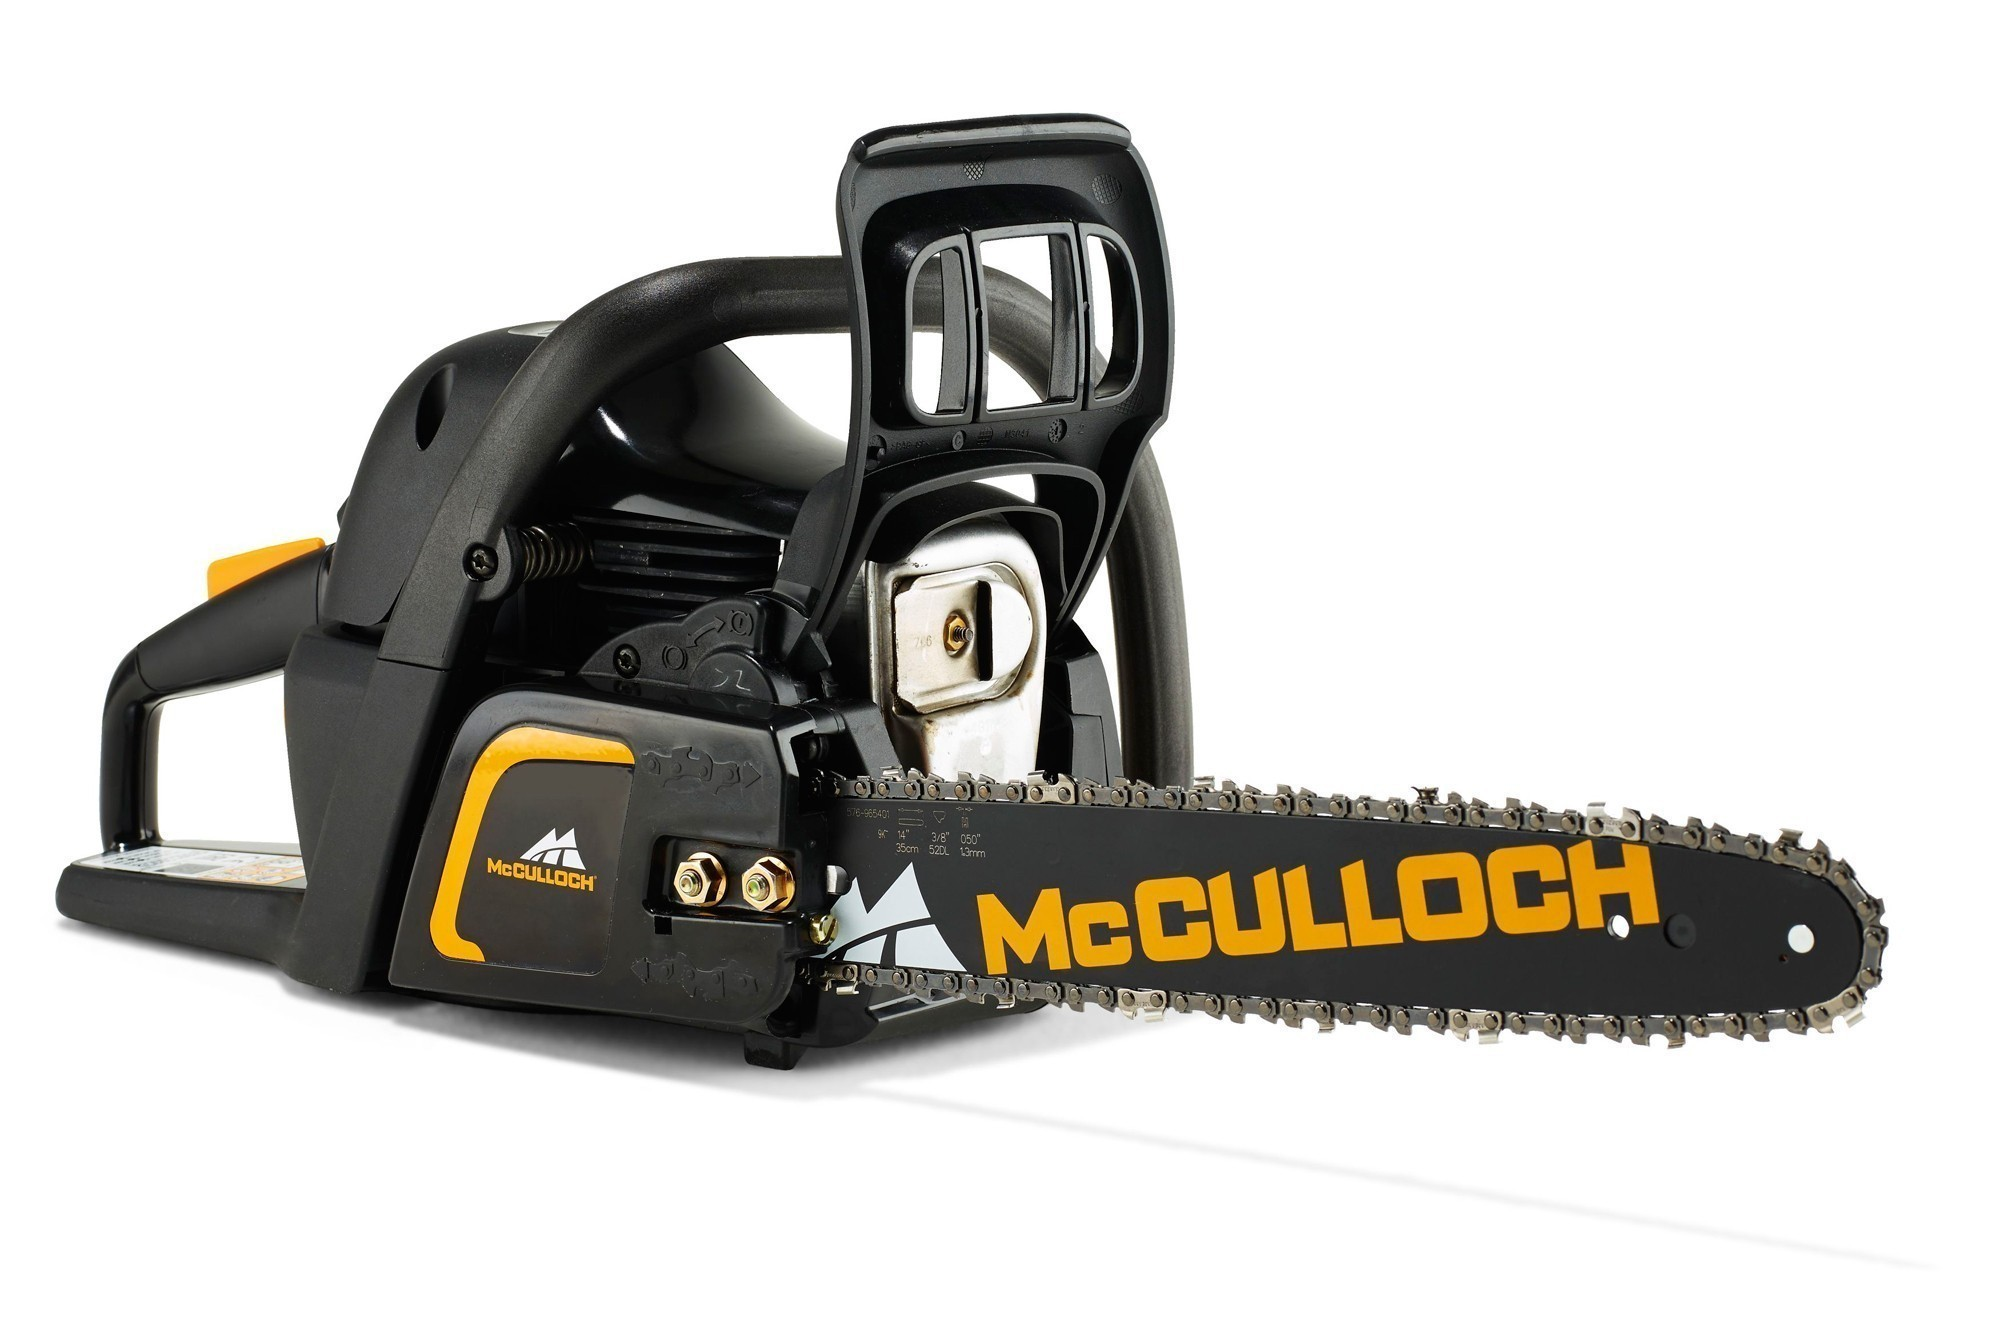 McCulloch Benzin Kettensäge CS42S Schwertlänge 35cm Bild 1